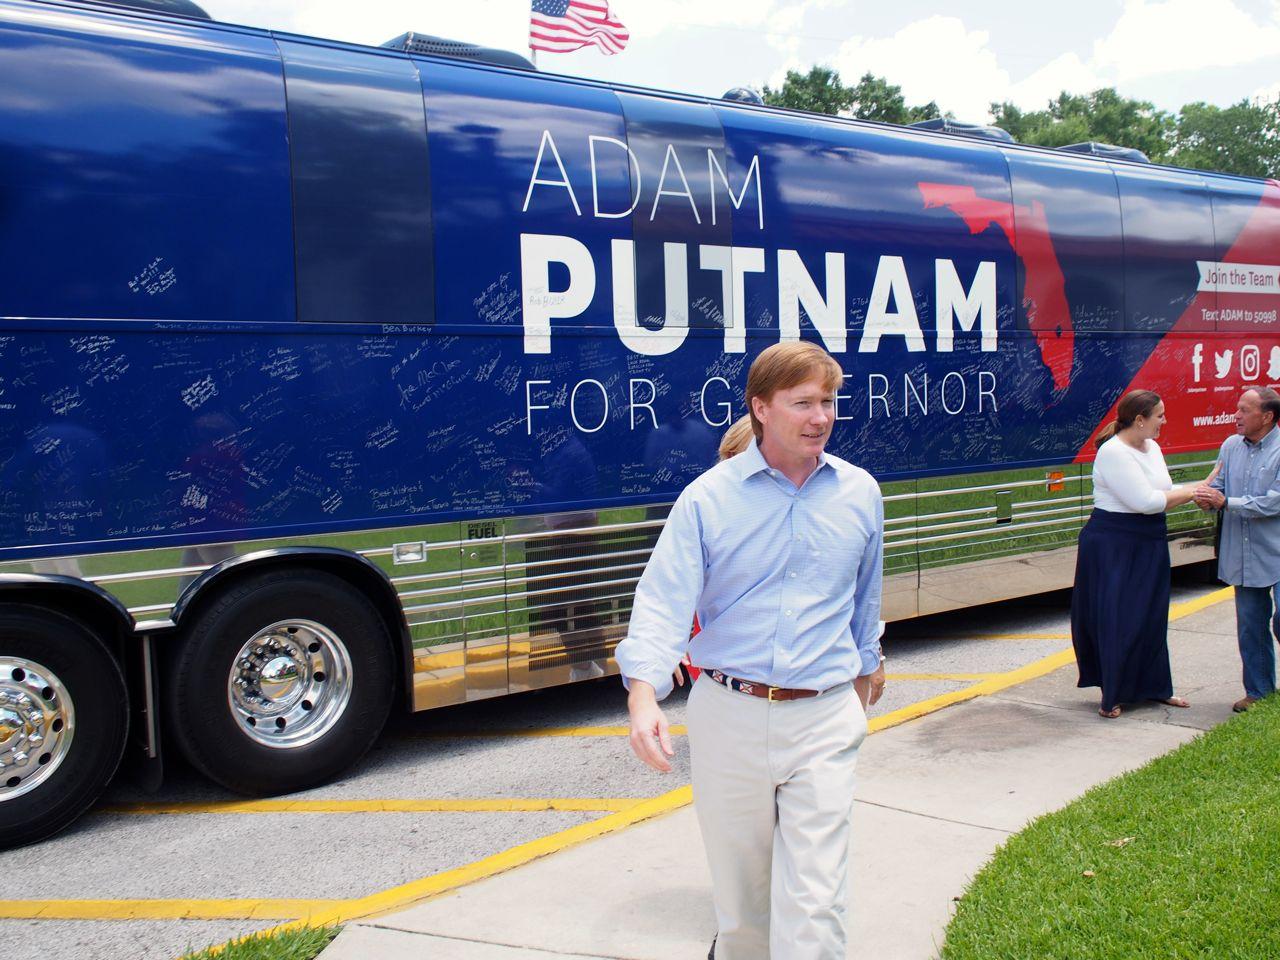 Adam-Putnam-2.jpg